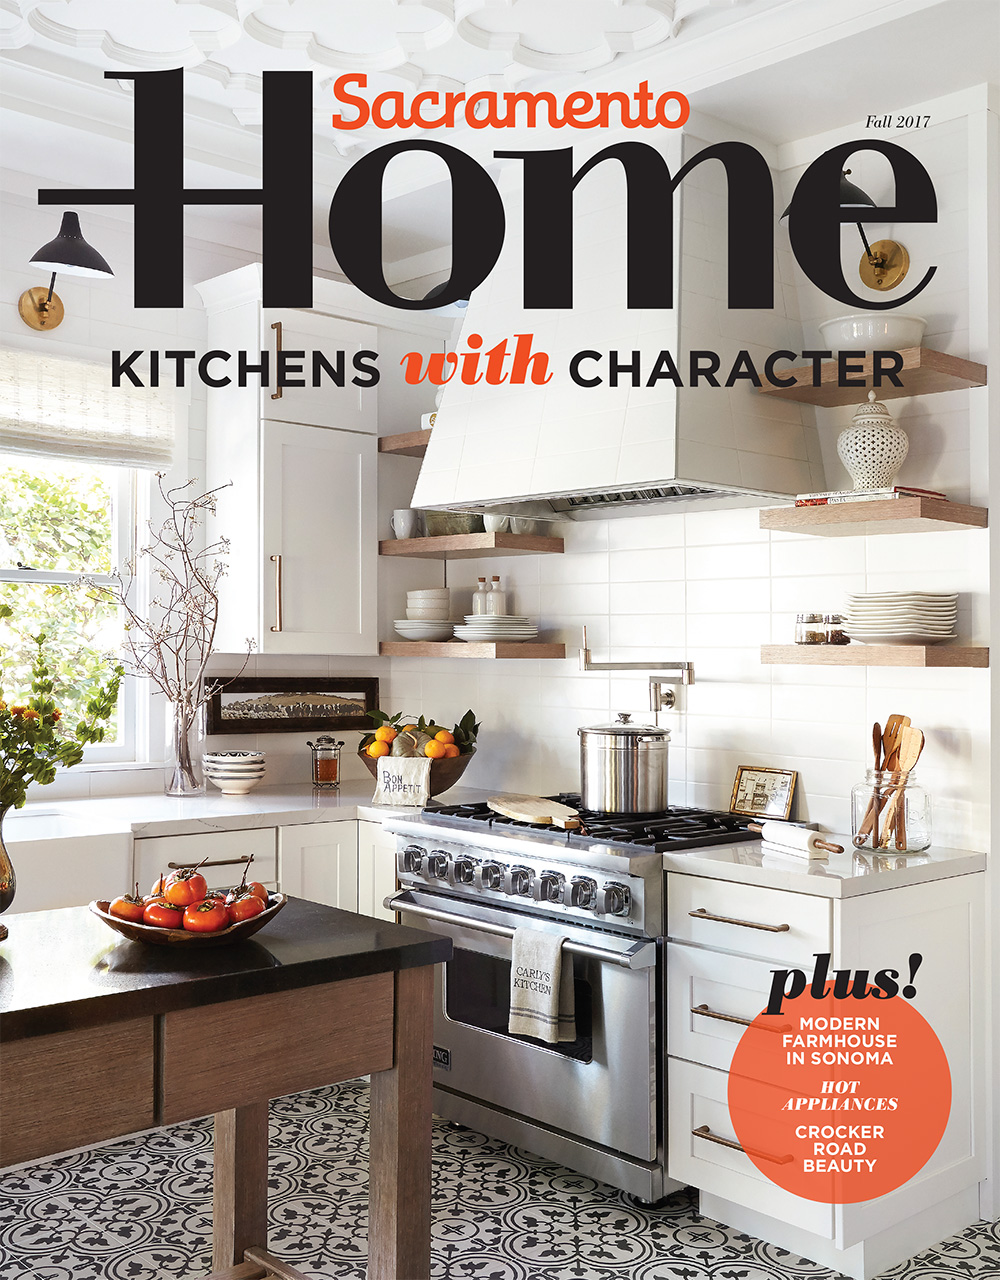 Gift Subscription to Sacramento Home Magazine